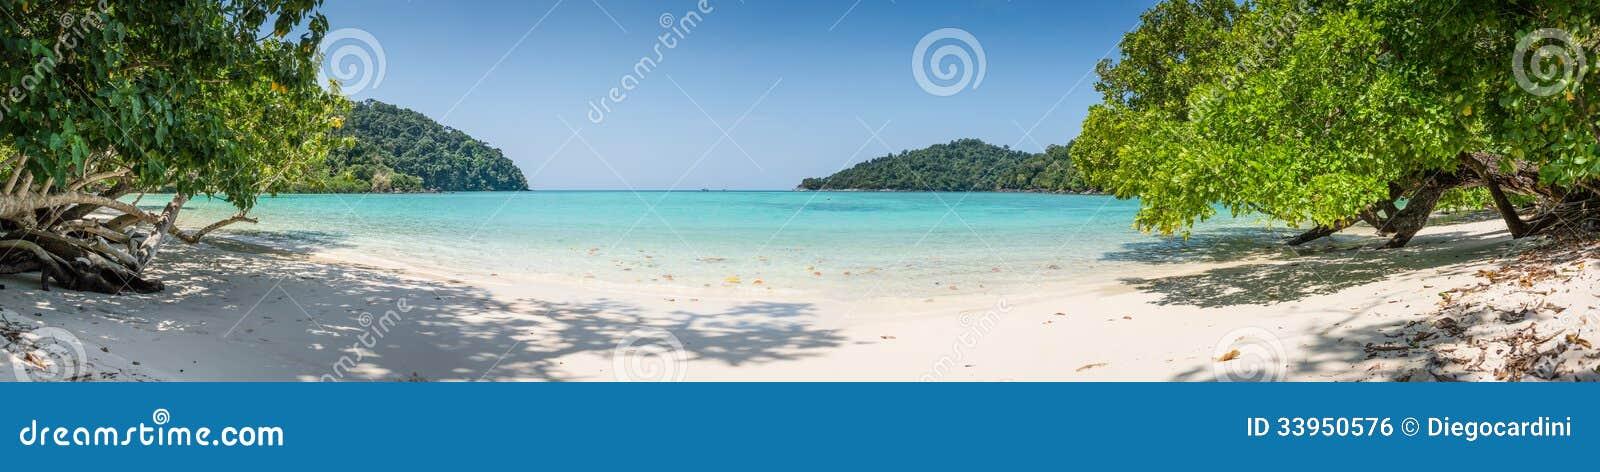 Huge Panorama Wild Tropical Beach. Turuoise Sea at Surin Island Marine Park. Thailand.